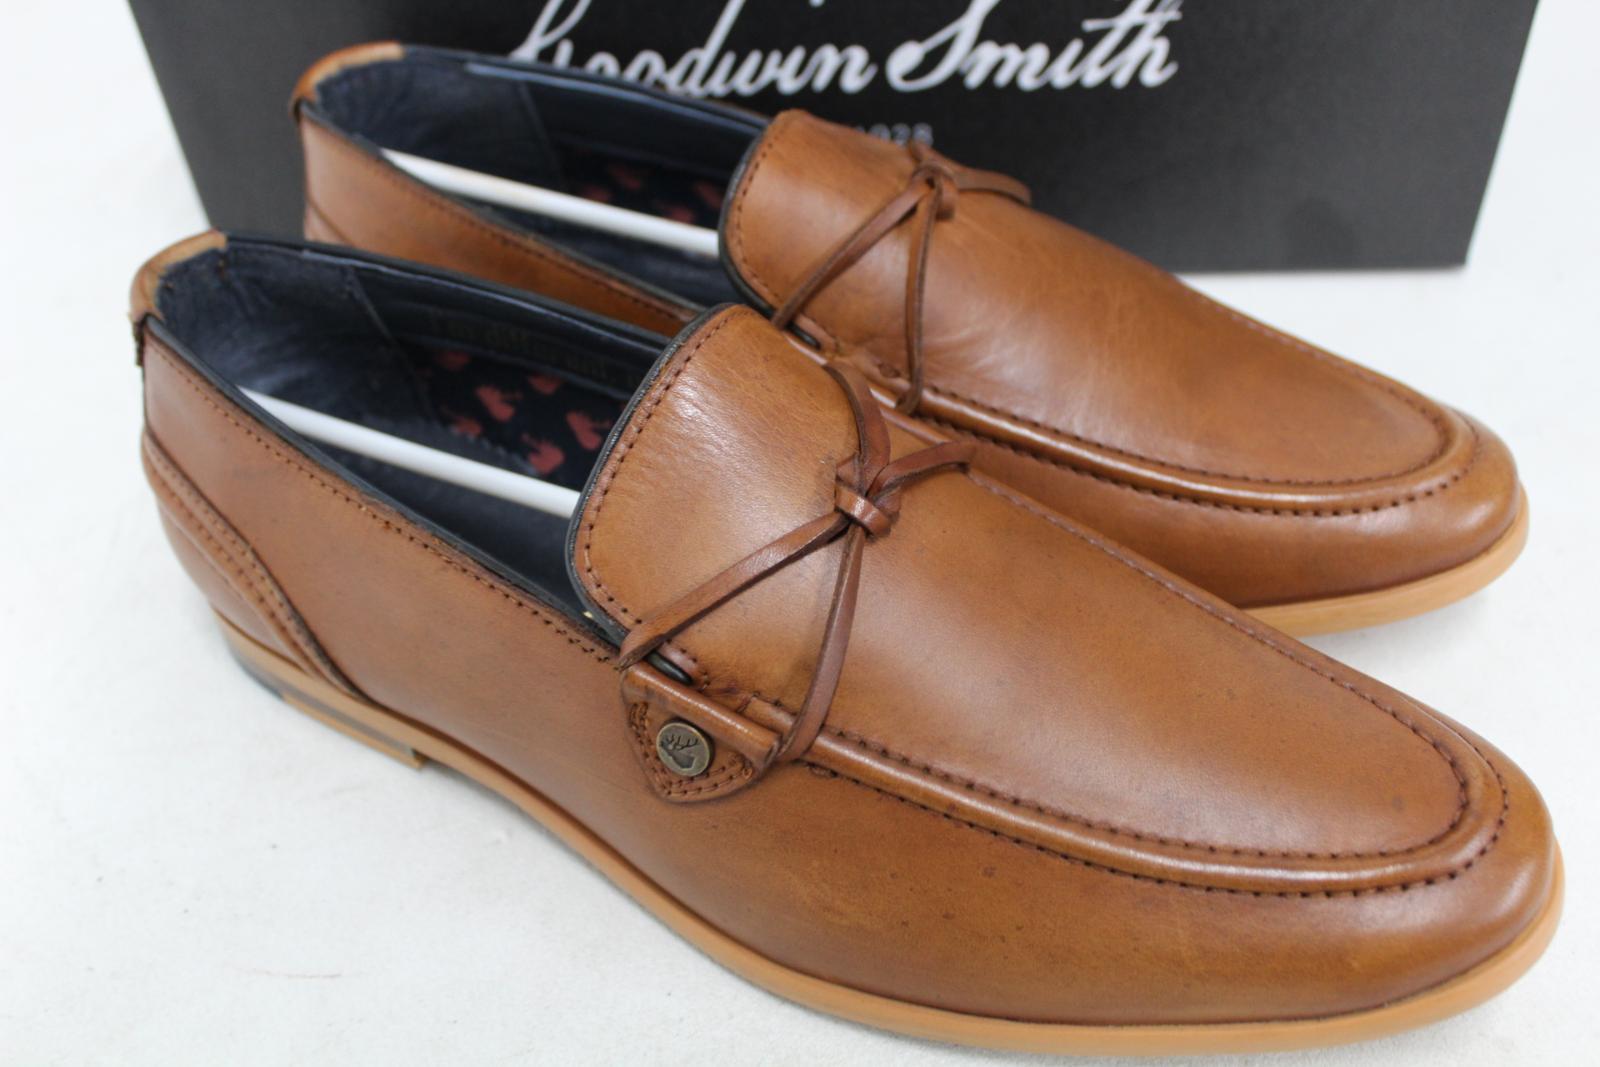 Goodwin-Smith-Para-Hombre-Napoli-Tanga-Zapato-Marron-Sin-Cordones-Mocasin-Cuero-UK8-EU42-Nuevo miniatura 4